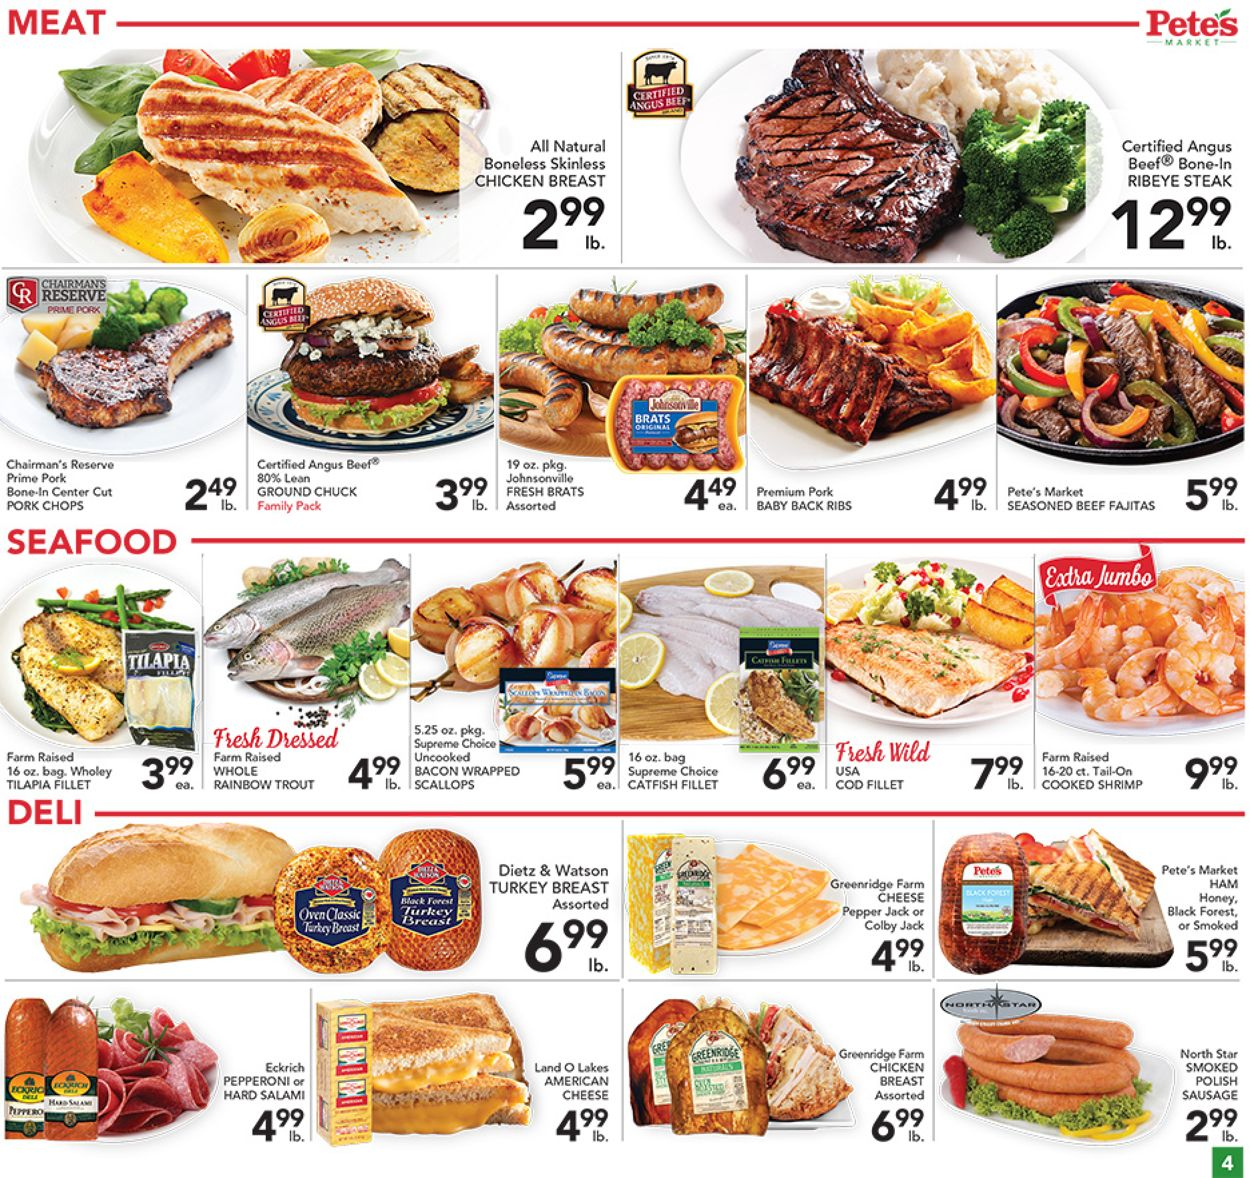 Pete's Fresh Market Weekly Ad Circular - valid 07/28-08/03/2021 (Page 4)